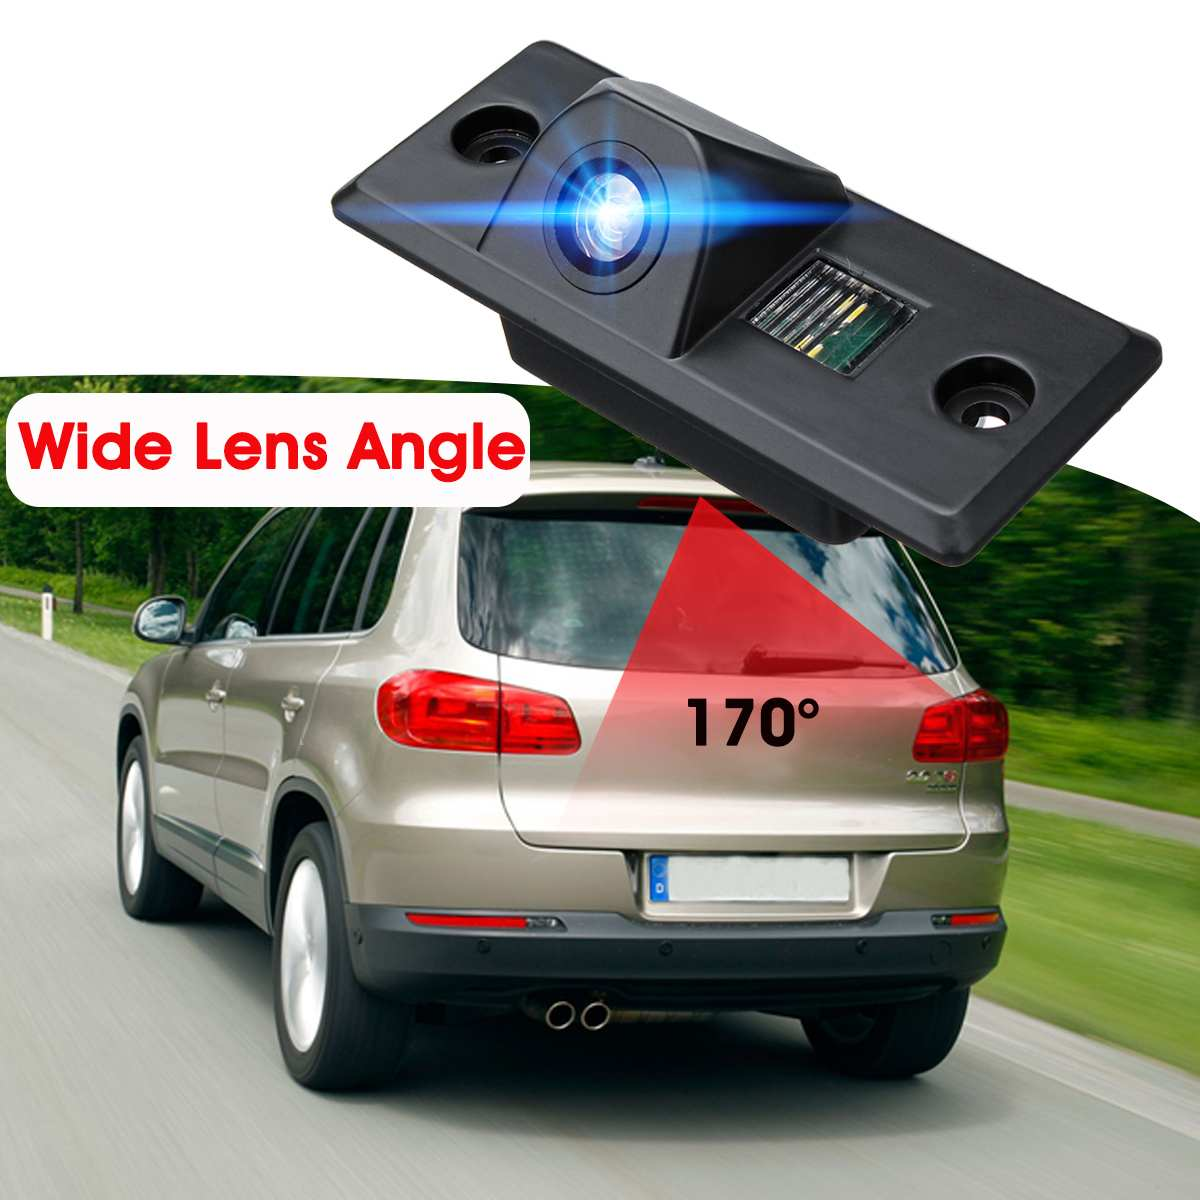 cheapest Car Rear View Camera Reverse Backup Parking for VW Tiguan Golf Mk4 Bora Polo Passat Jetta Porsche Cayenne Skoda Fabia Yeti